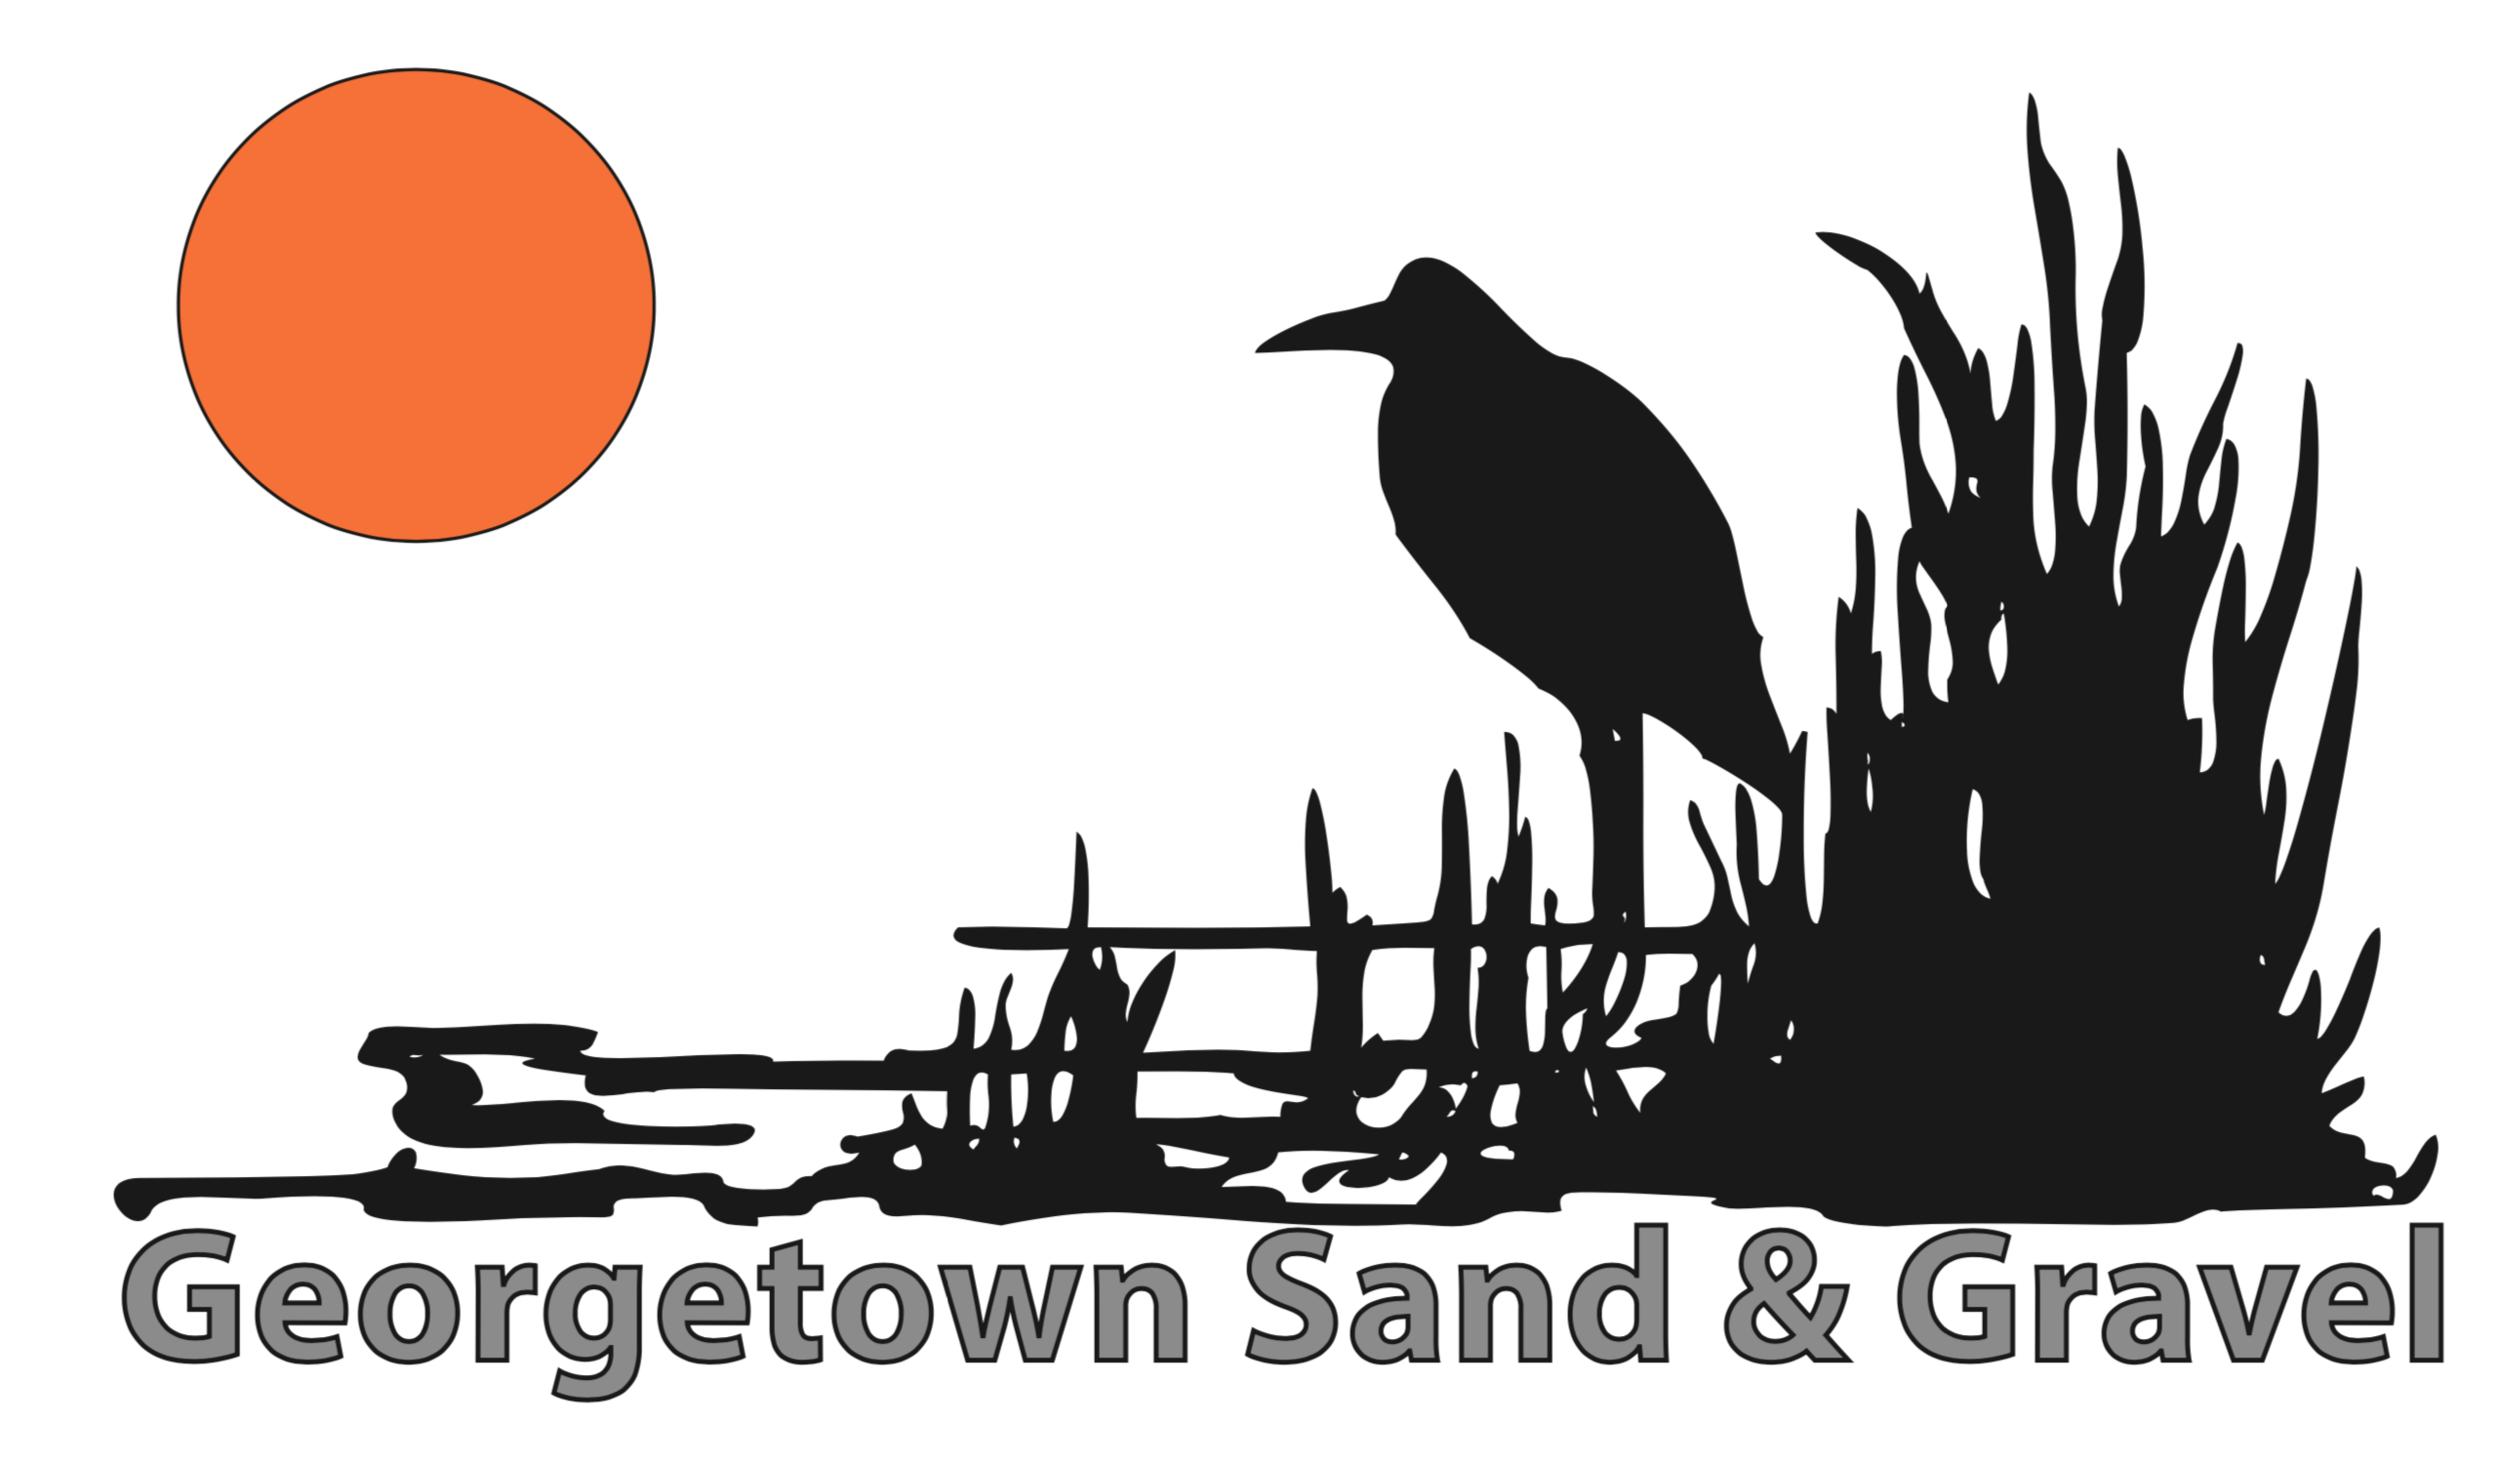 Georgetown Sand & Gravel